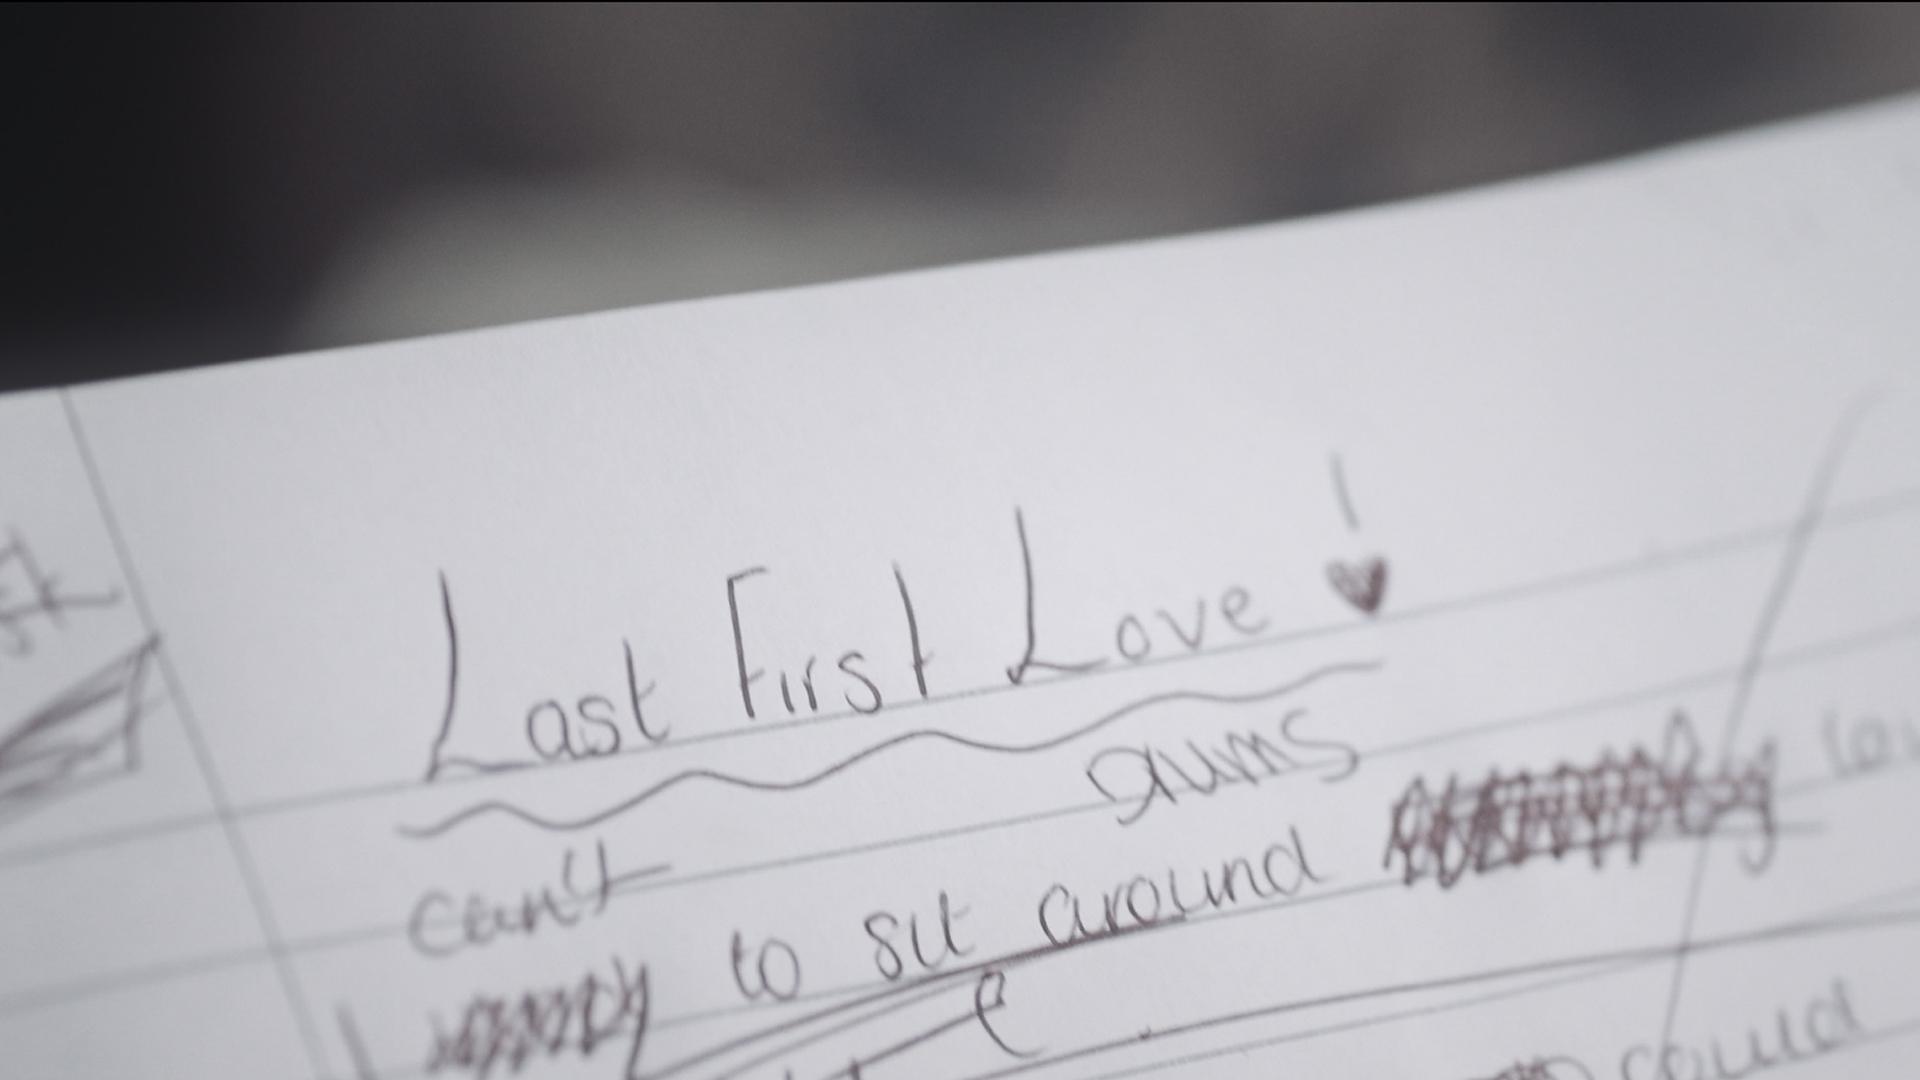 Last First Love (Music Video)